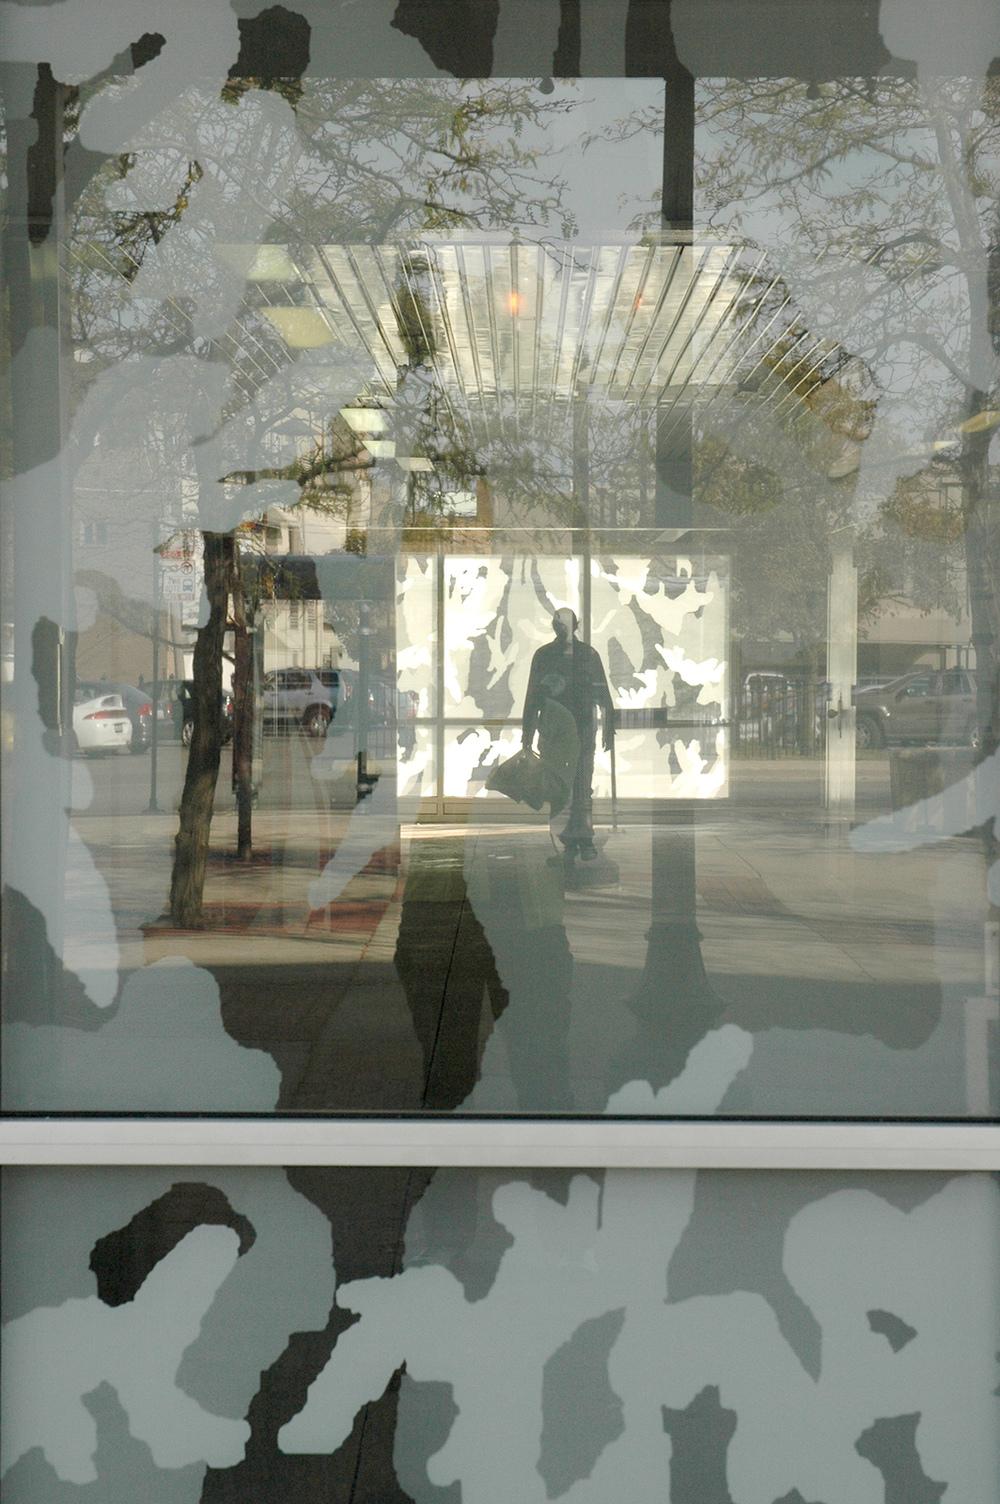 Shadow Screens: exterior and interior views 2007